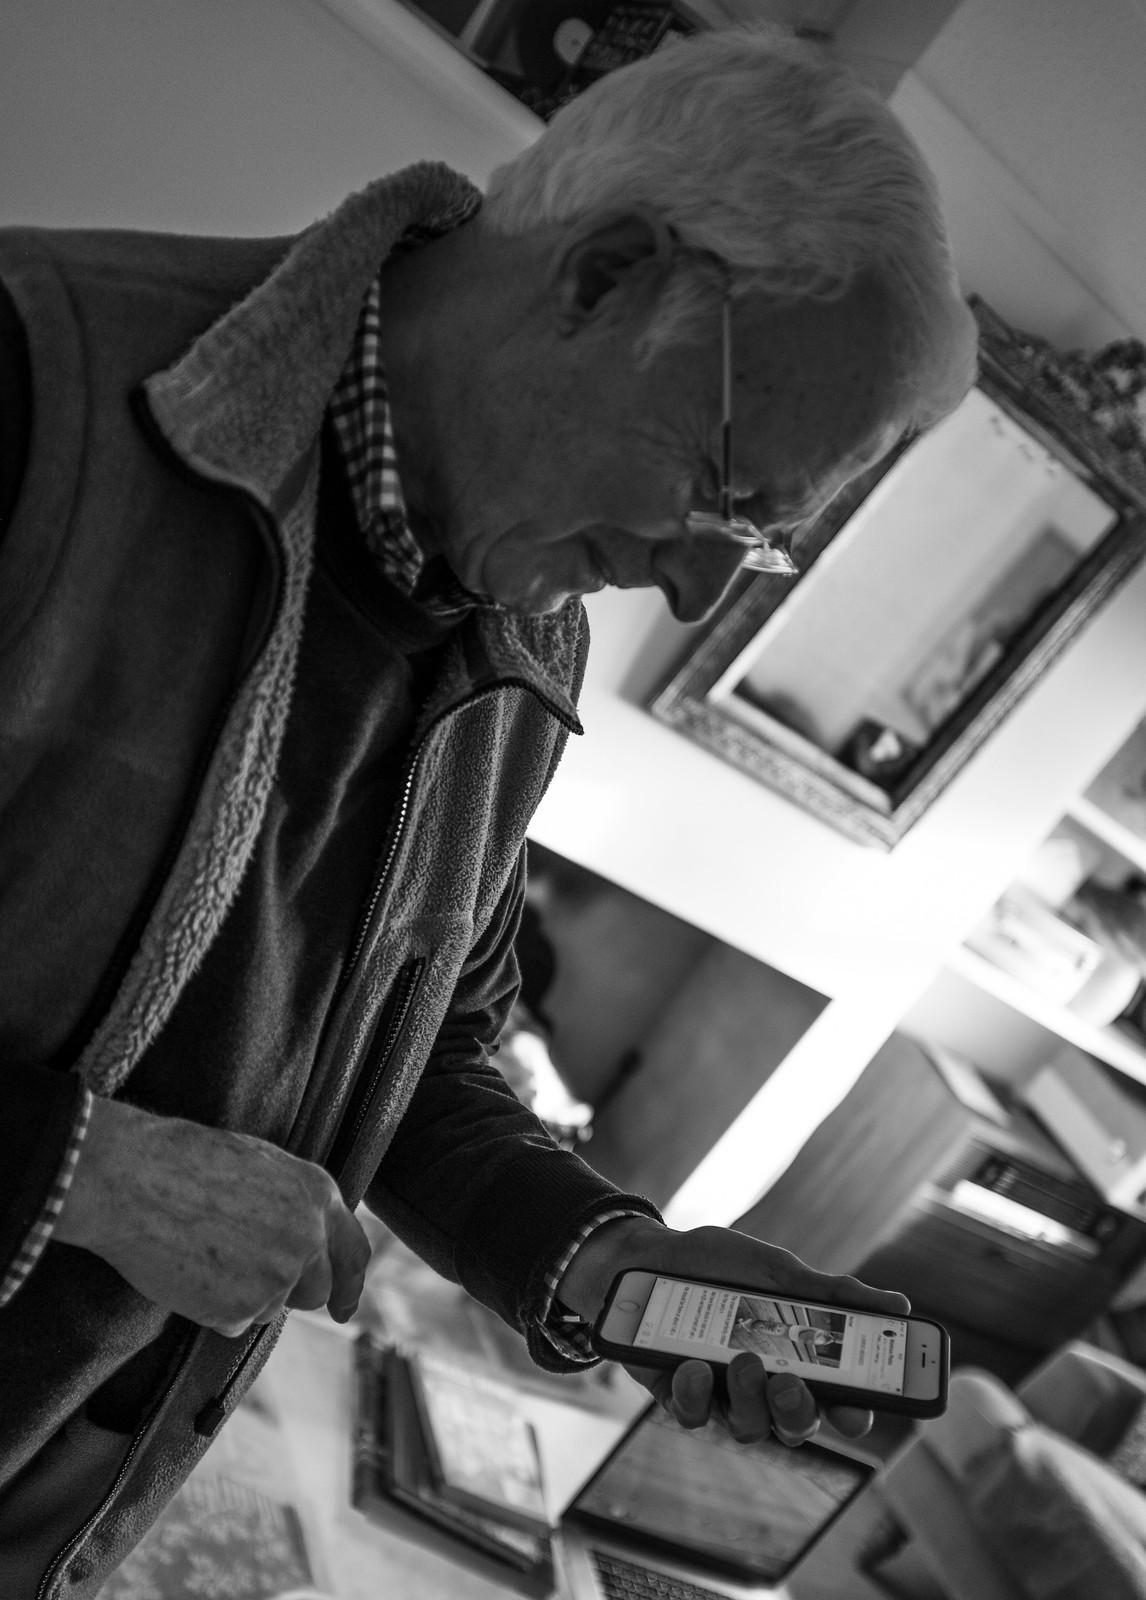 Granddad checking in